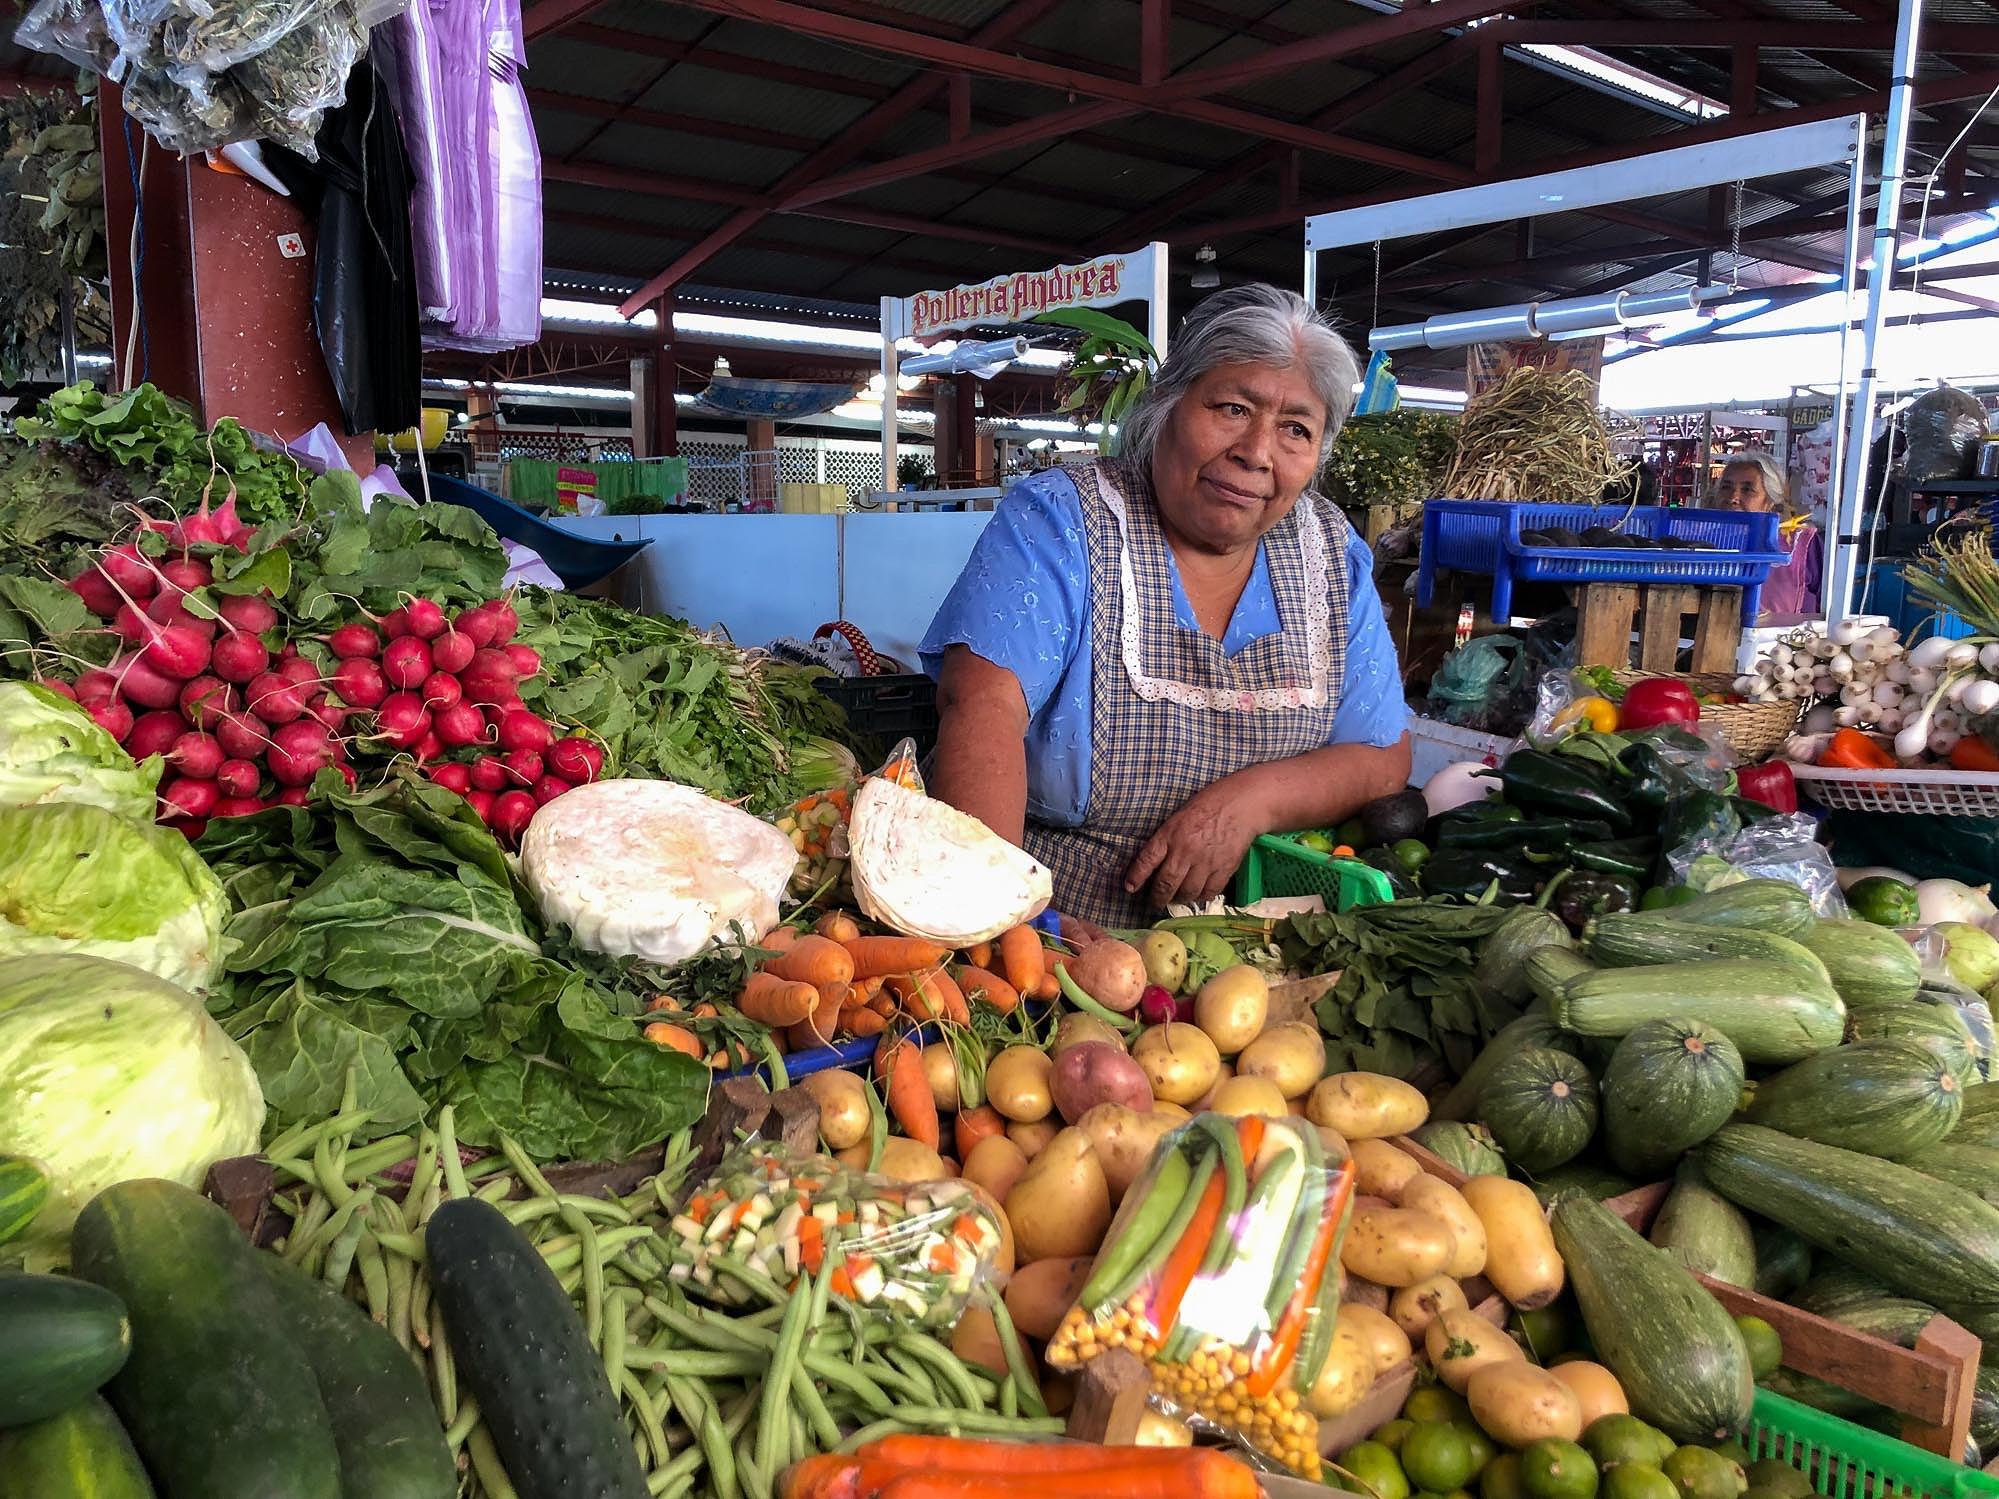 Tiacolula Market